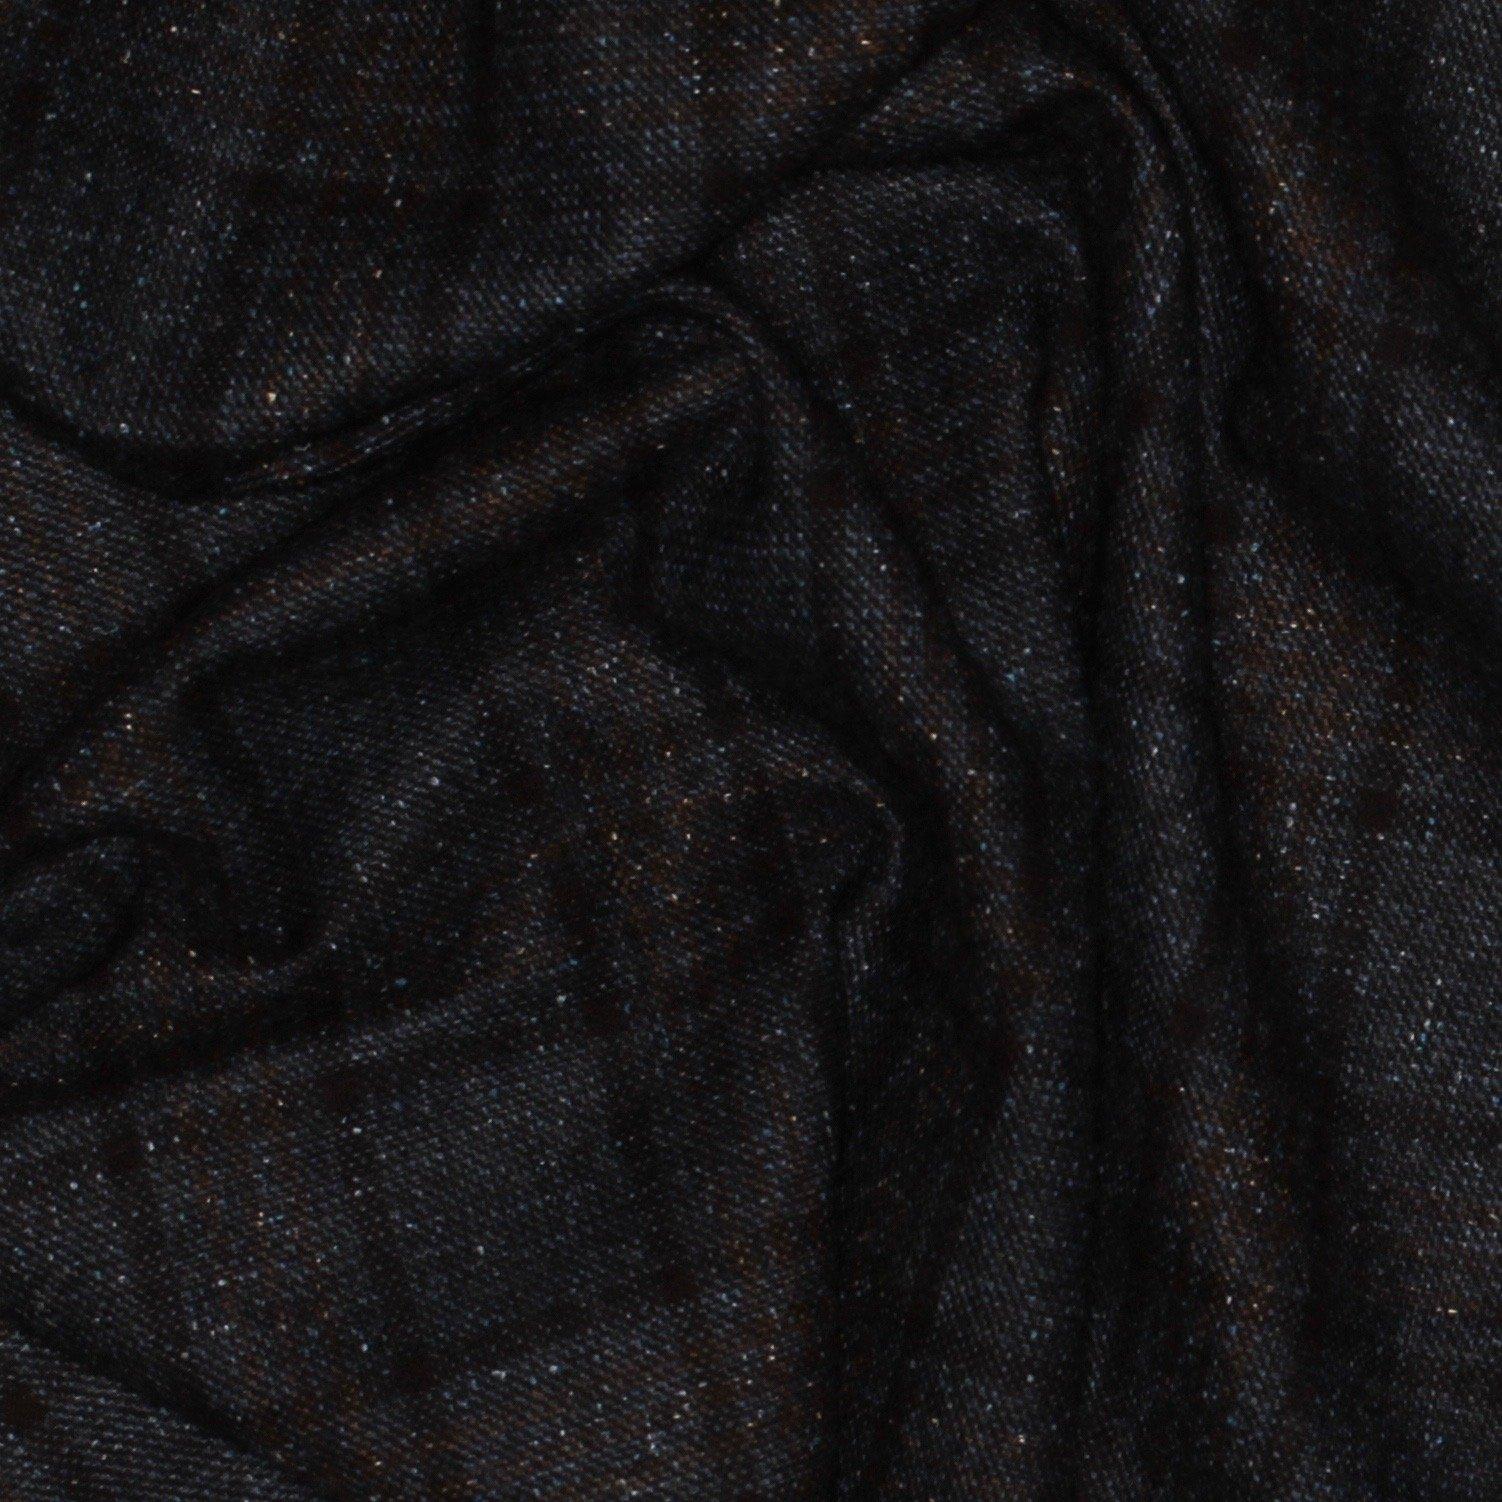 Blue/Black/Brown Plaid Italian Wool/Silk; 60; 77 Wool 23 Silk